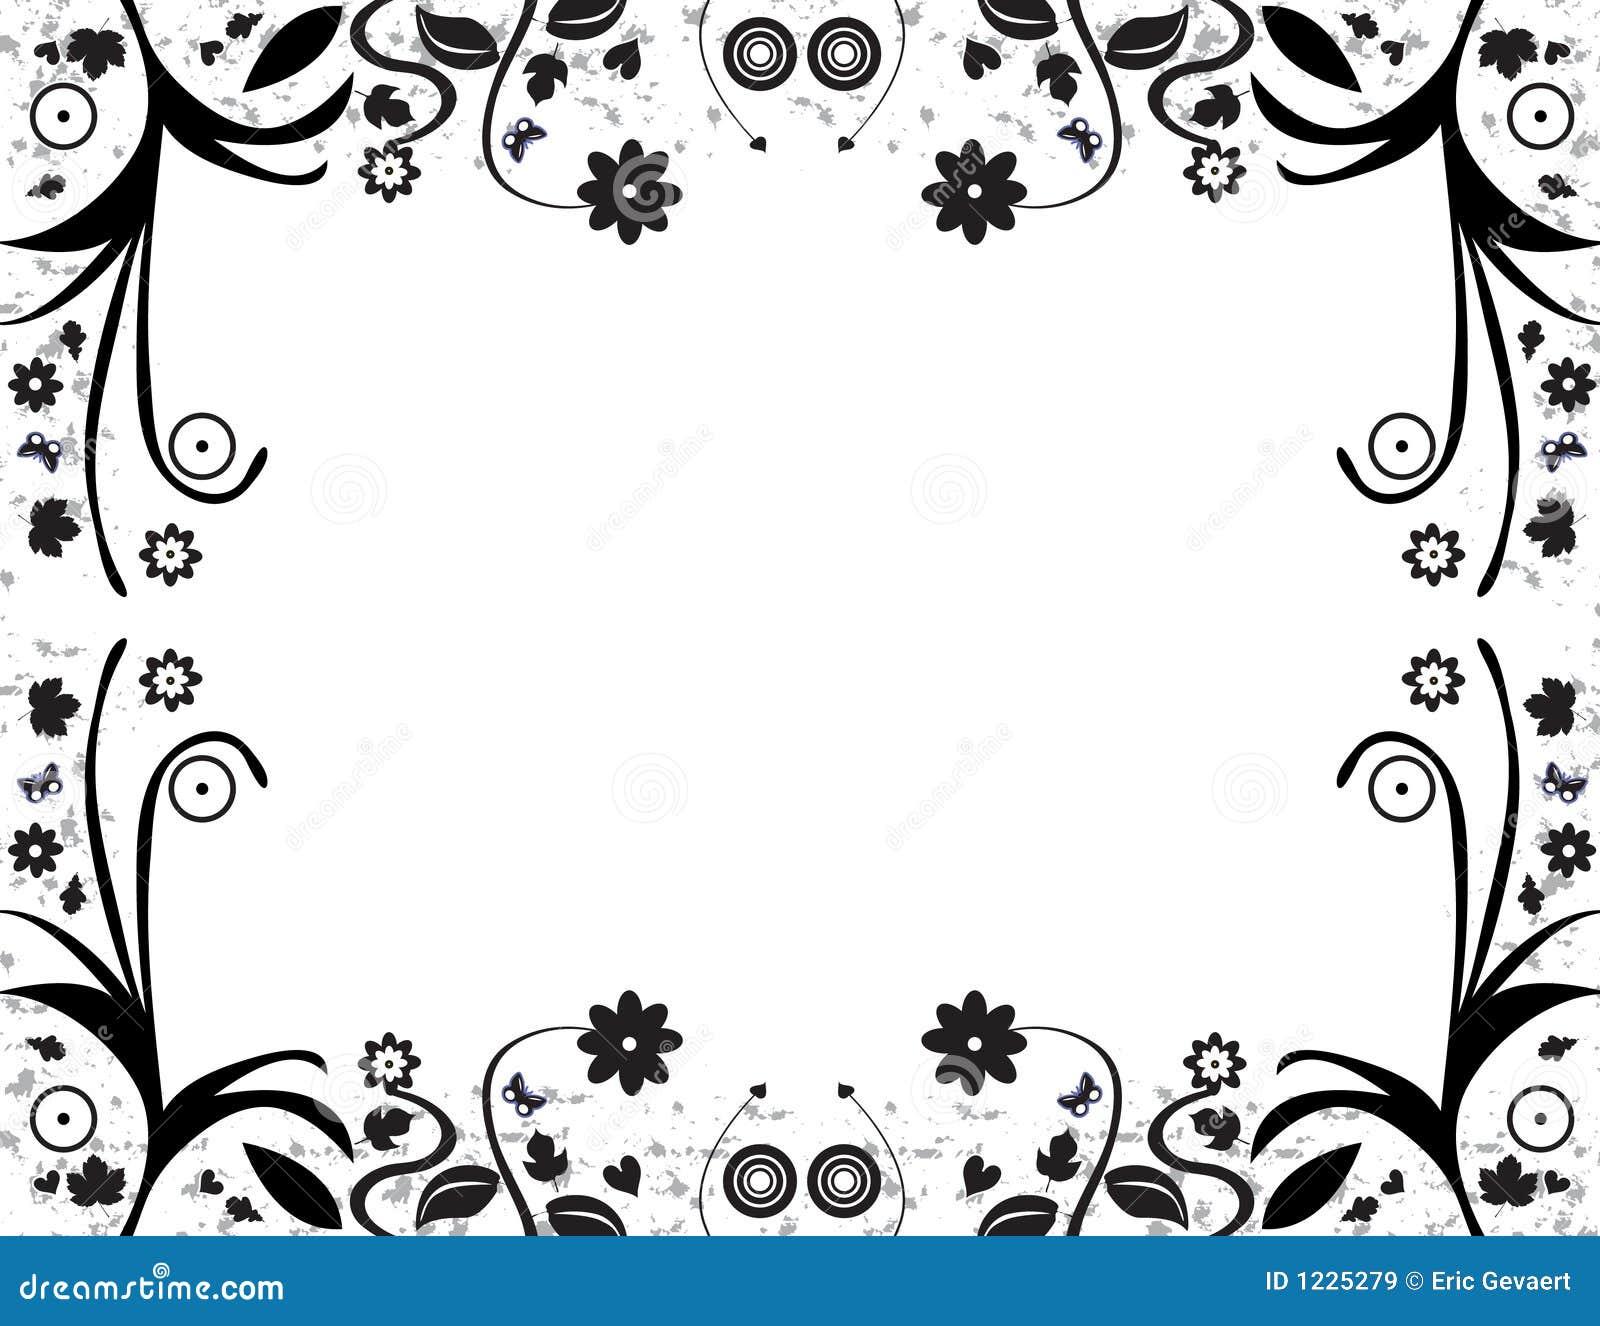 cadre de feuillage images libres de droits image 1225279. Black Bedroom Furniture Sets. Home Design Ideas